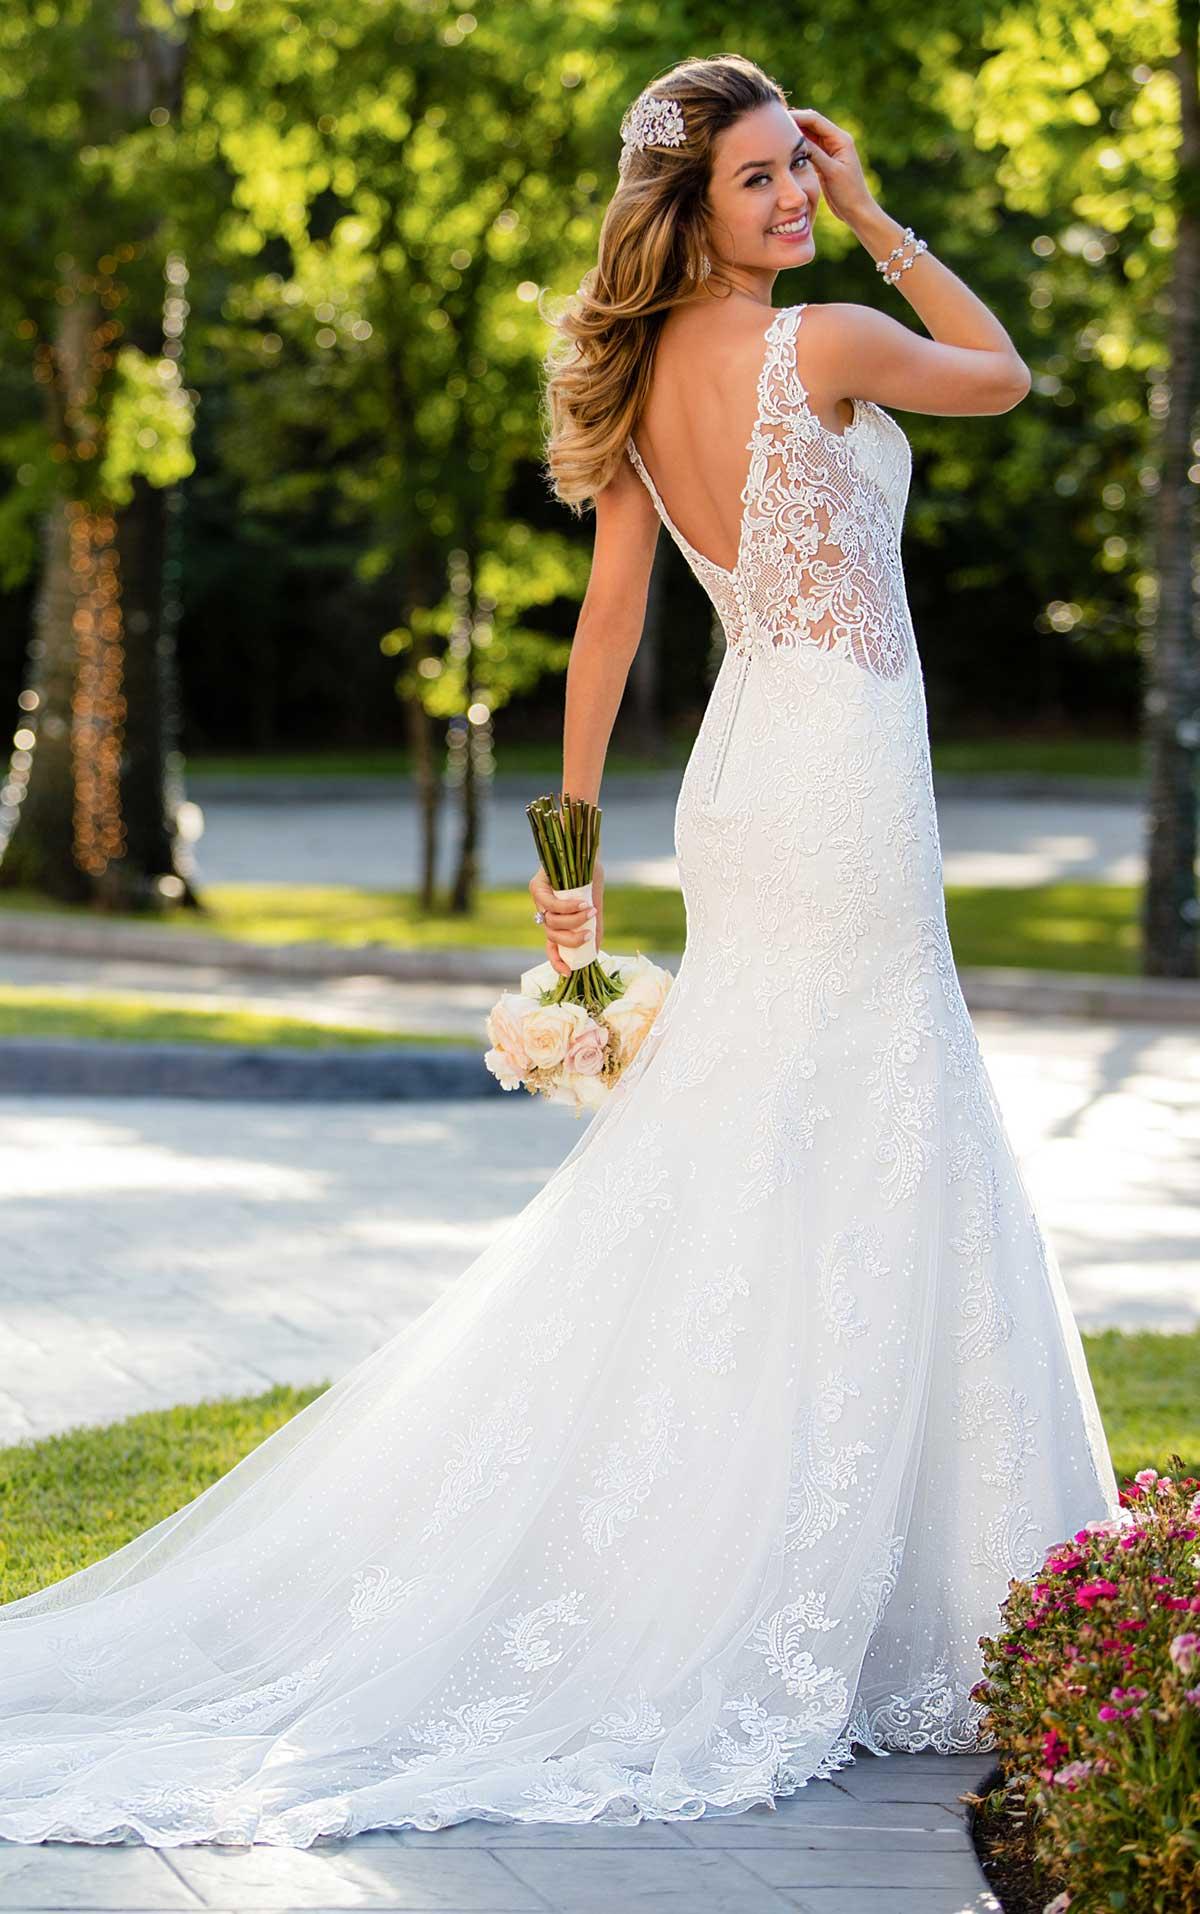 Fast Growing Designer Stella York Unveils New Bridal